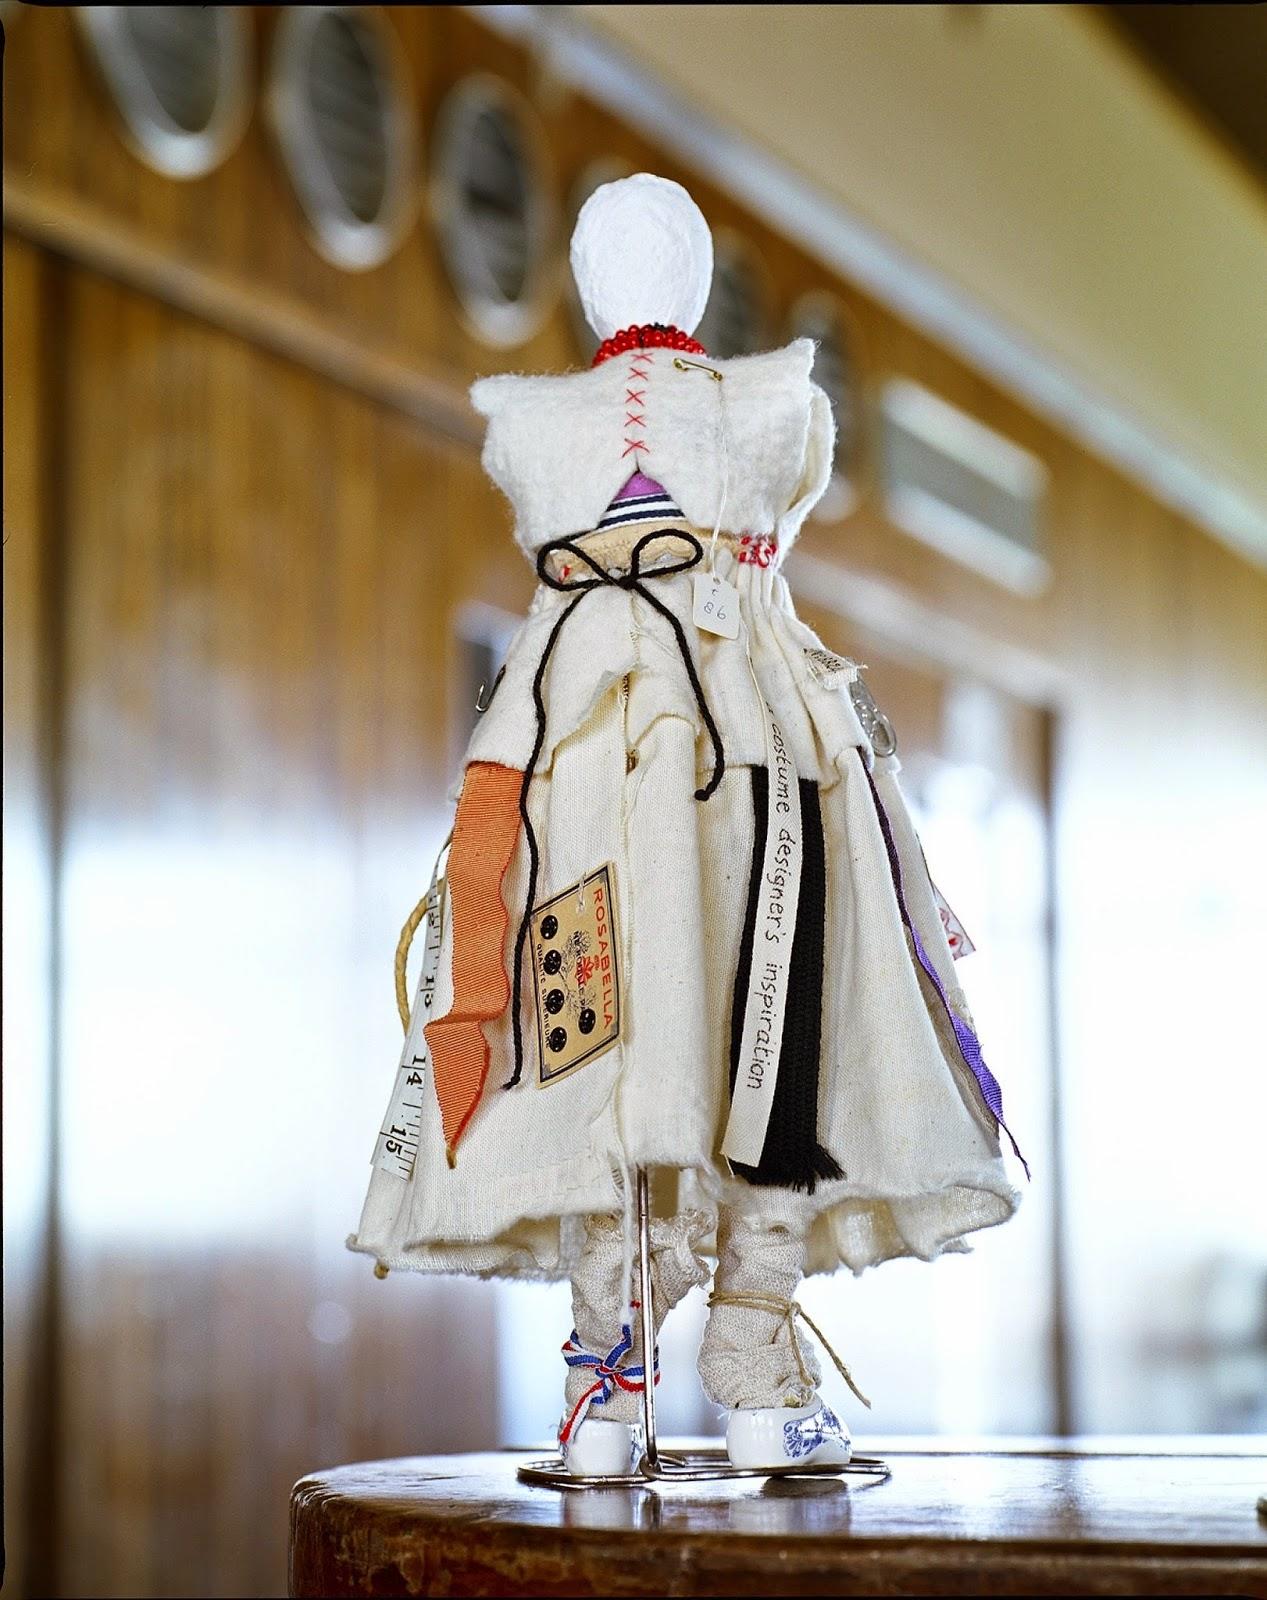 The Dolly © Concrete Collaborations, Concrete Editions, Sally Dyer, De La Warr Pavilion, avant garde dolls, artisan, handmade, national costume, Dutch national costume, clogs, bricolage,